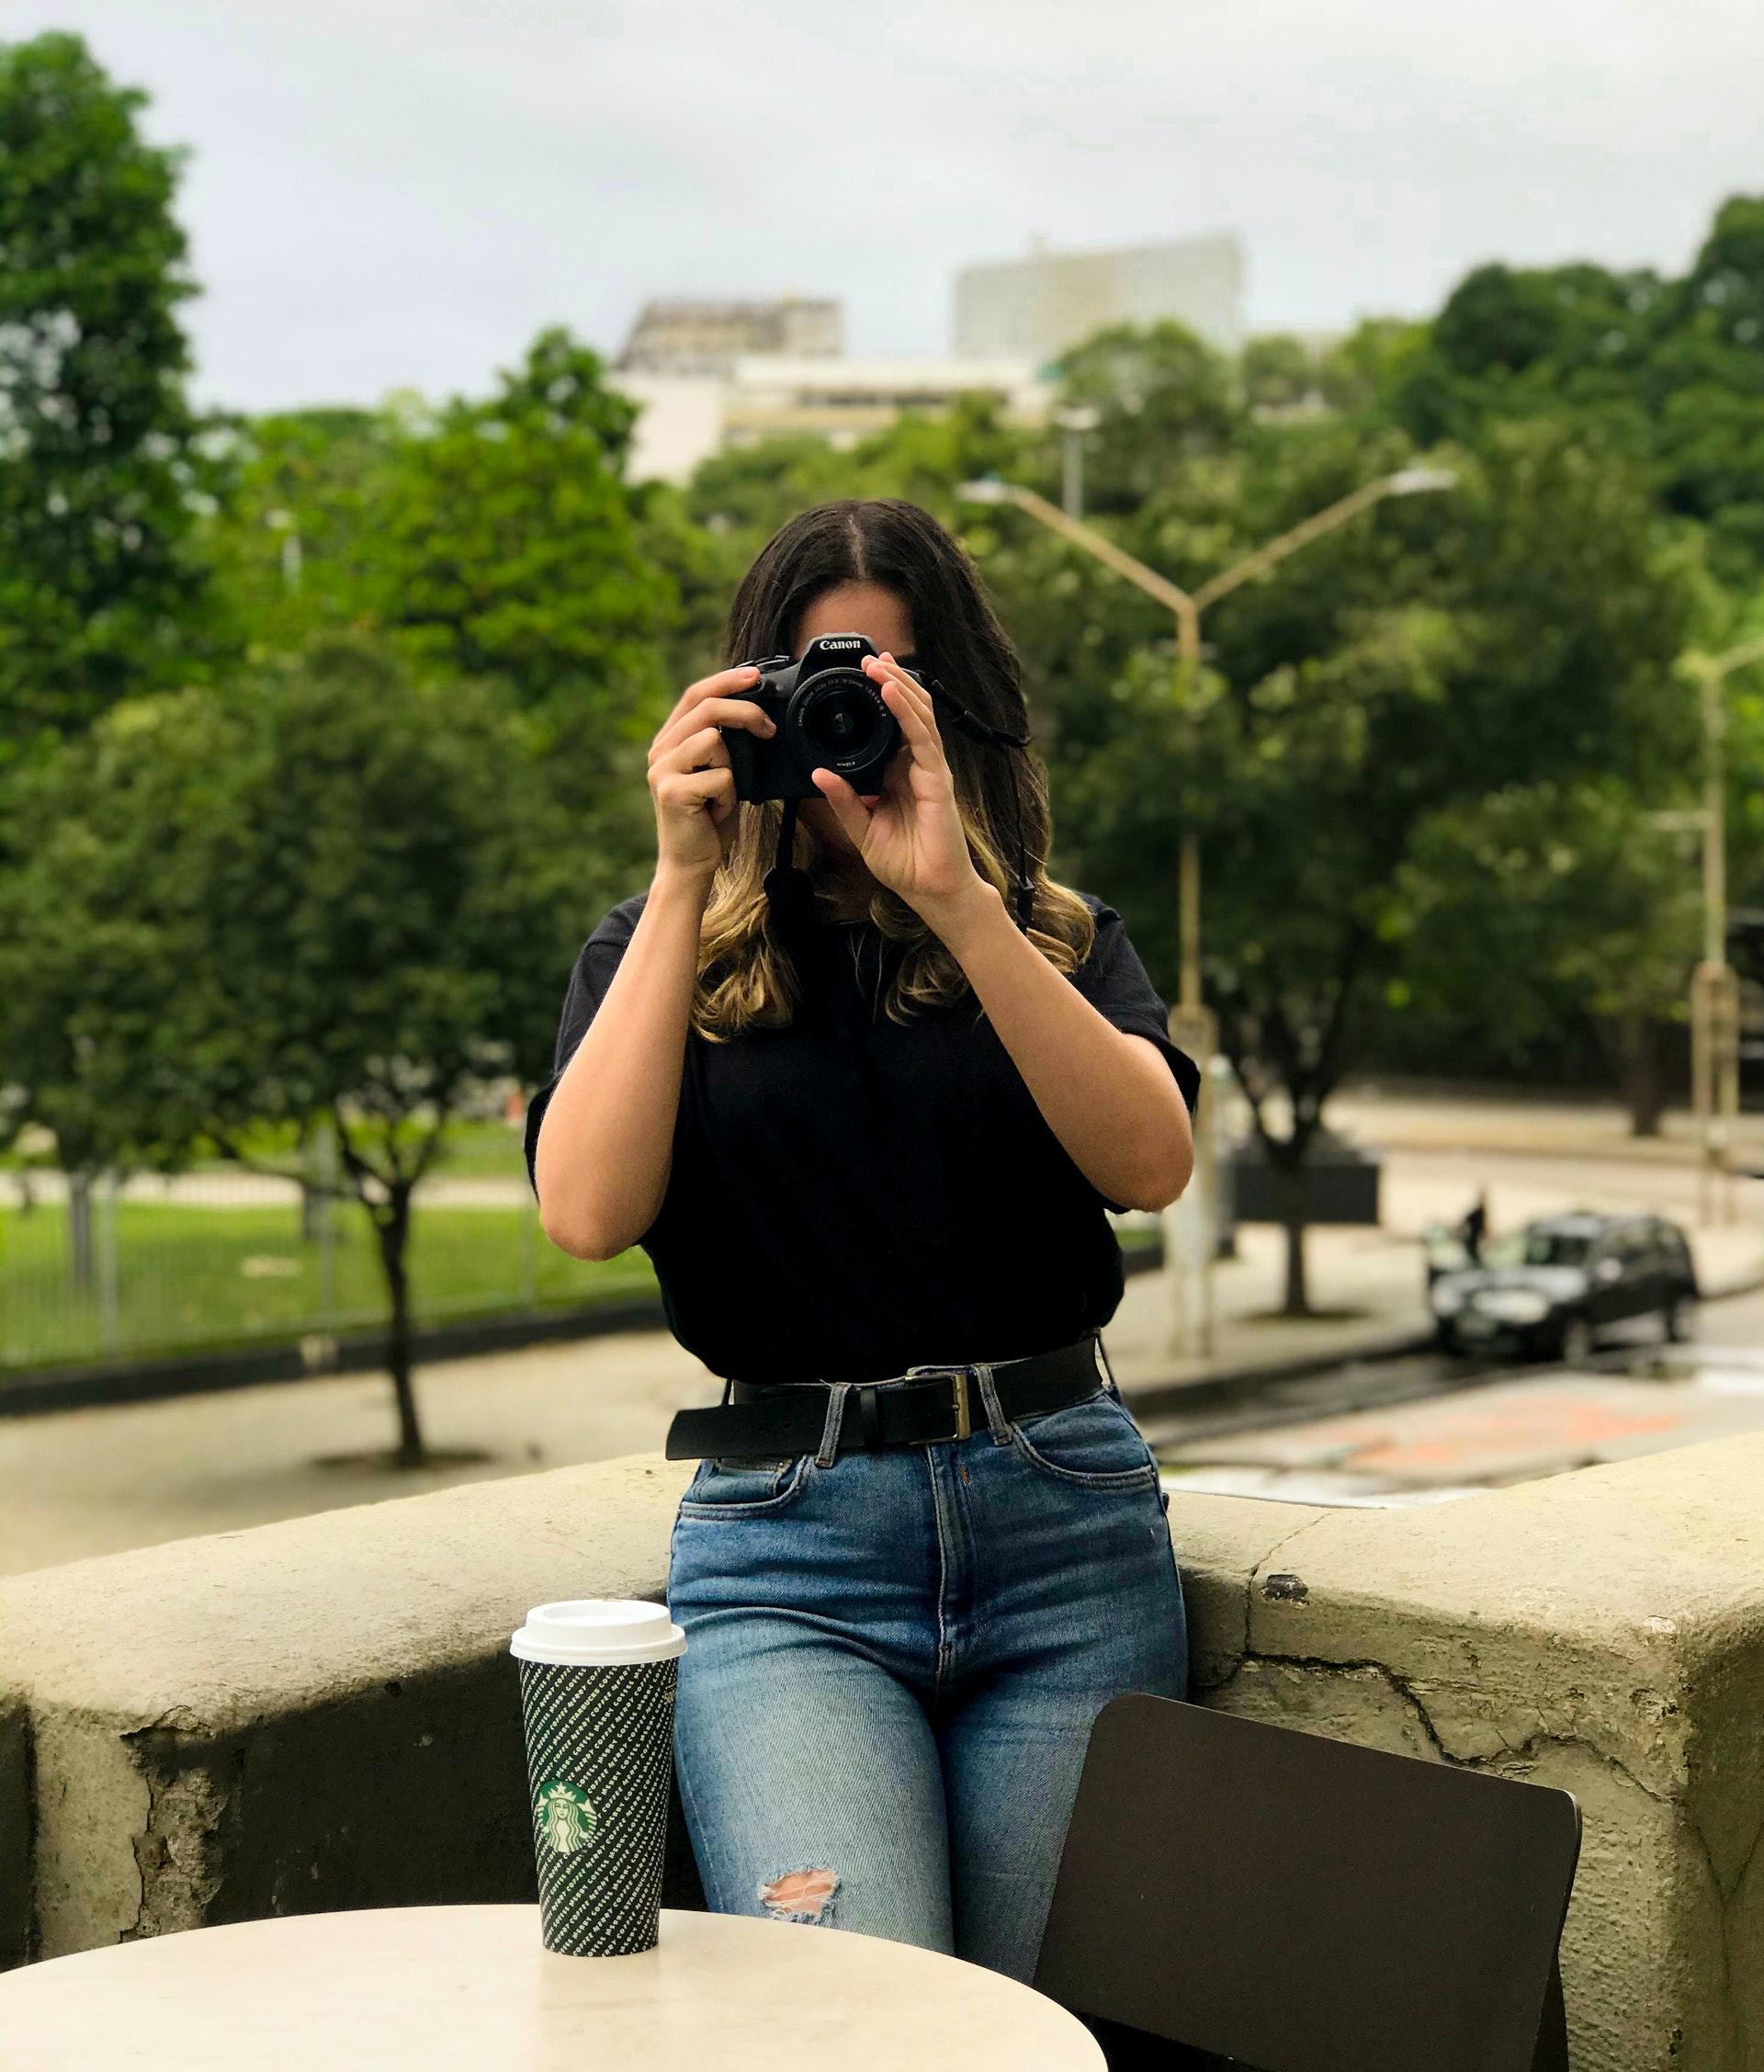 Canon Digital Camera: Express, Shoot and Share